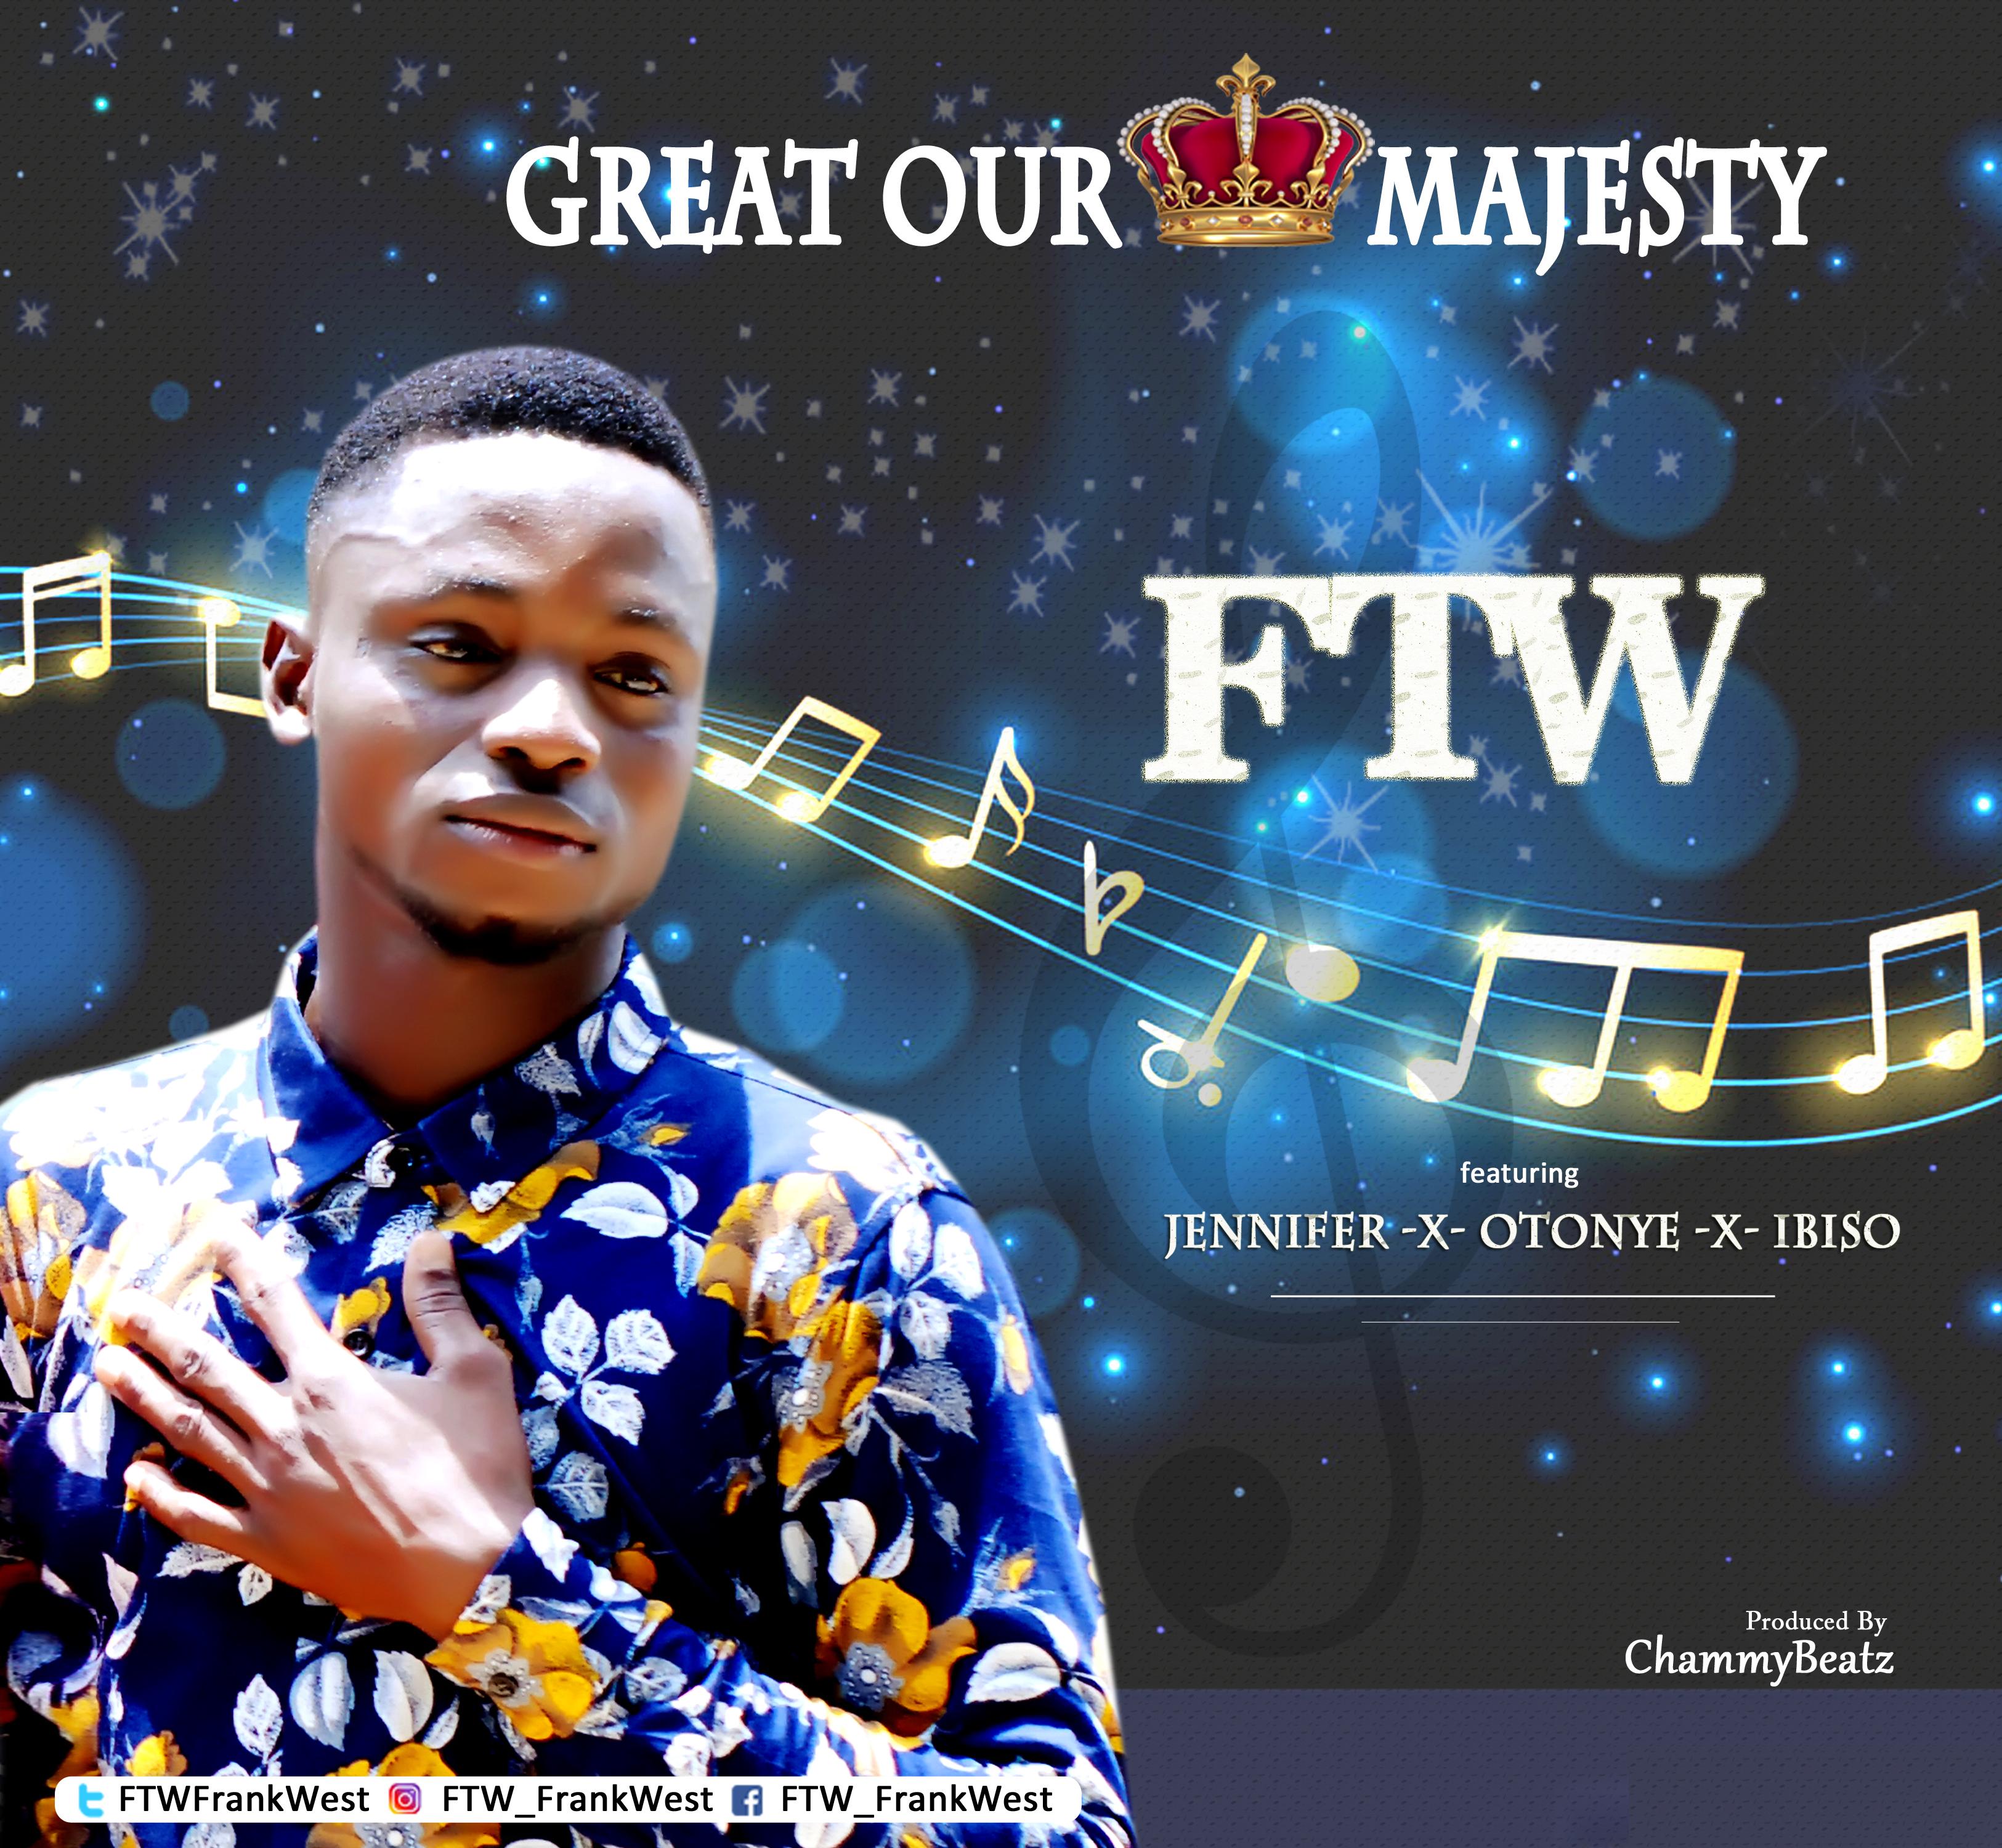 GREAT OUR MAJESTY - FTW ft Jennifer X Otonye X Ibiso